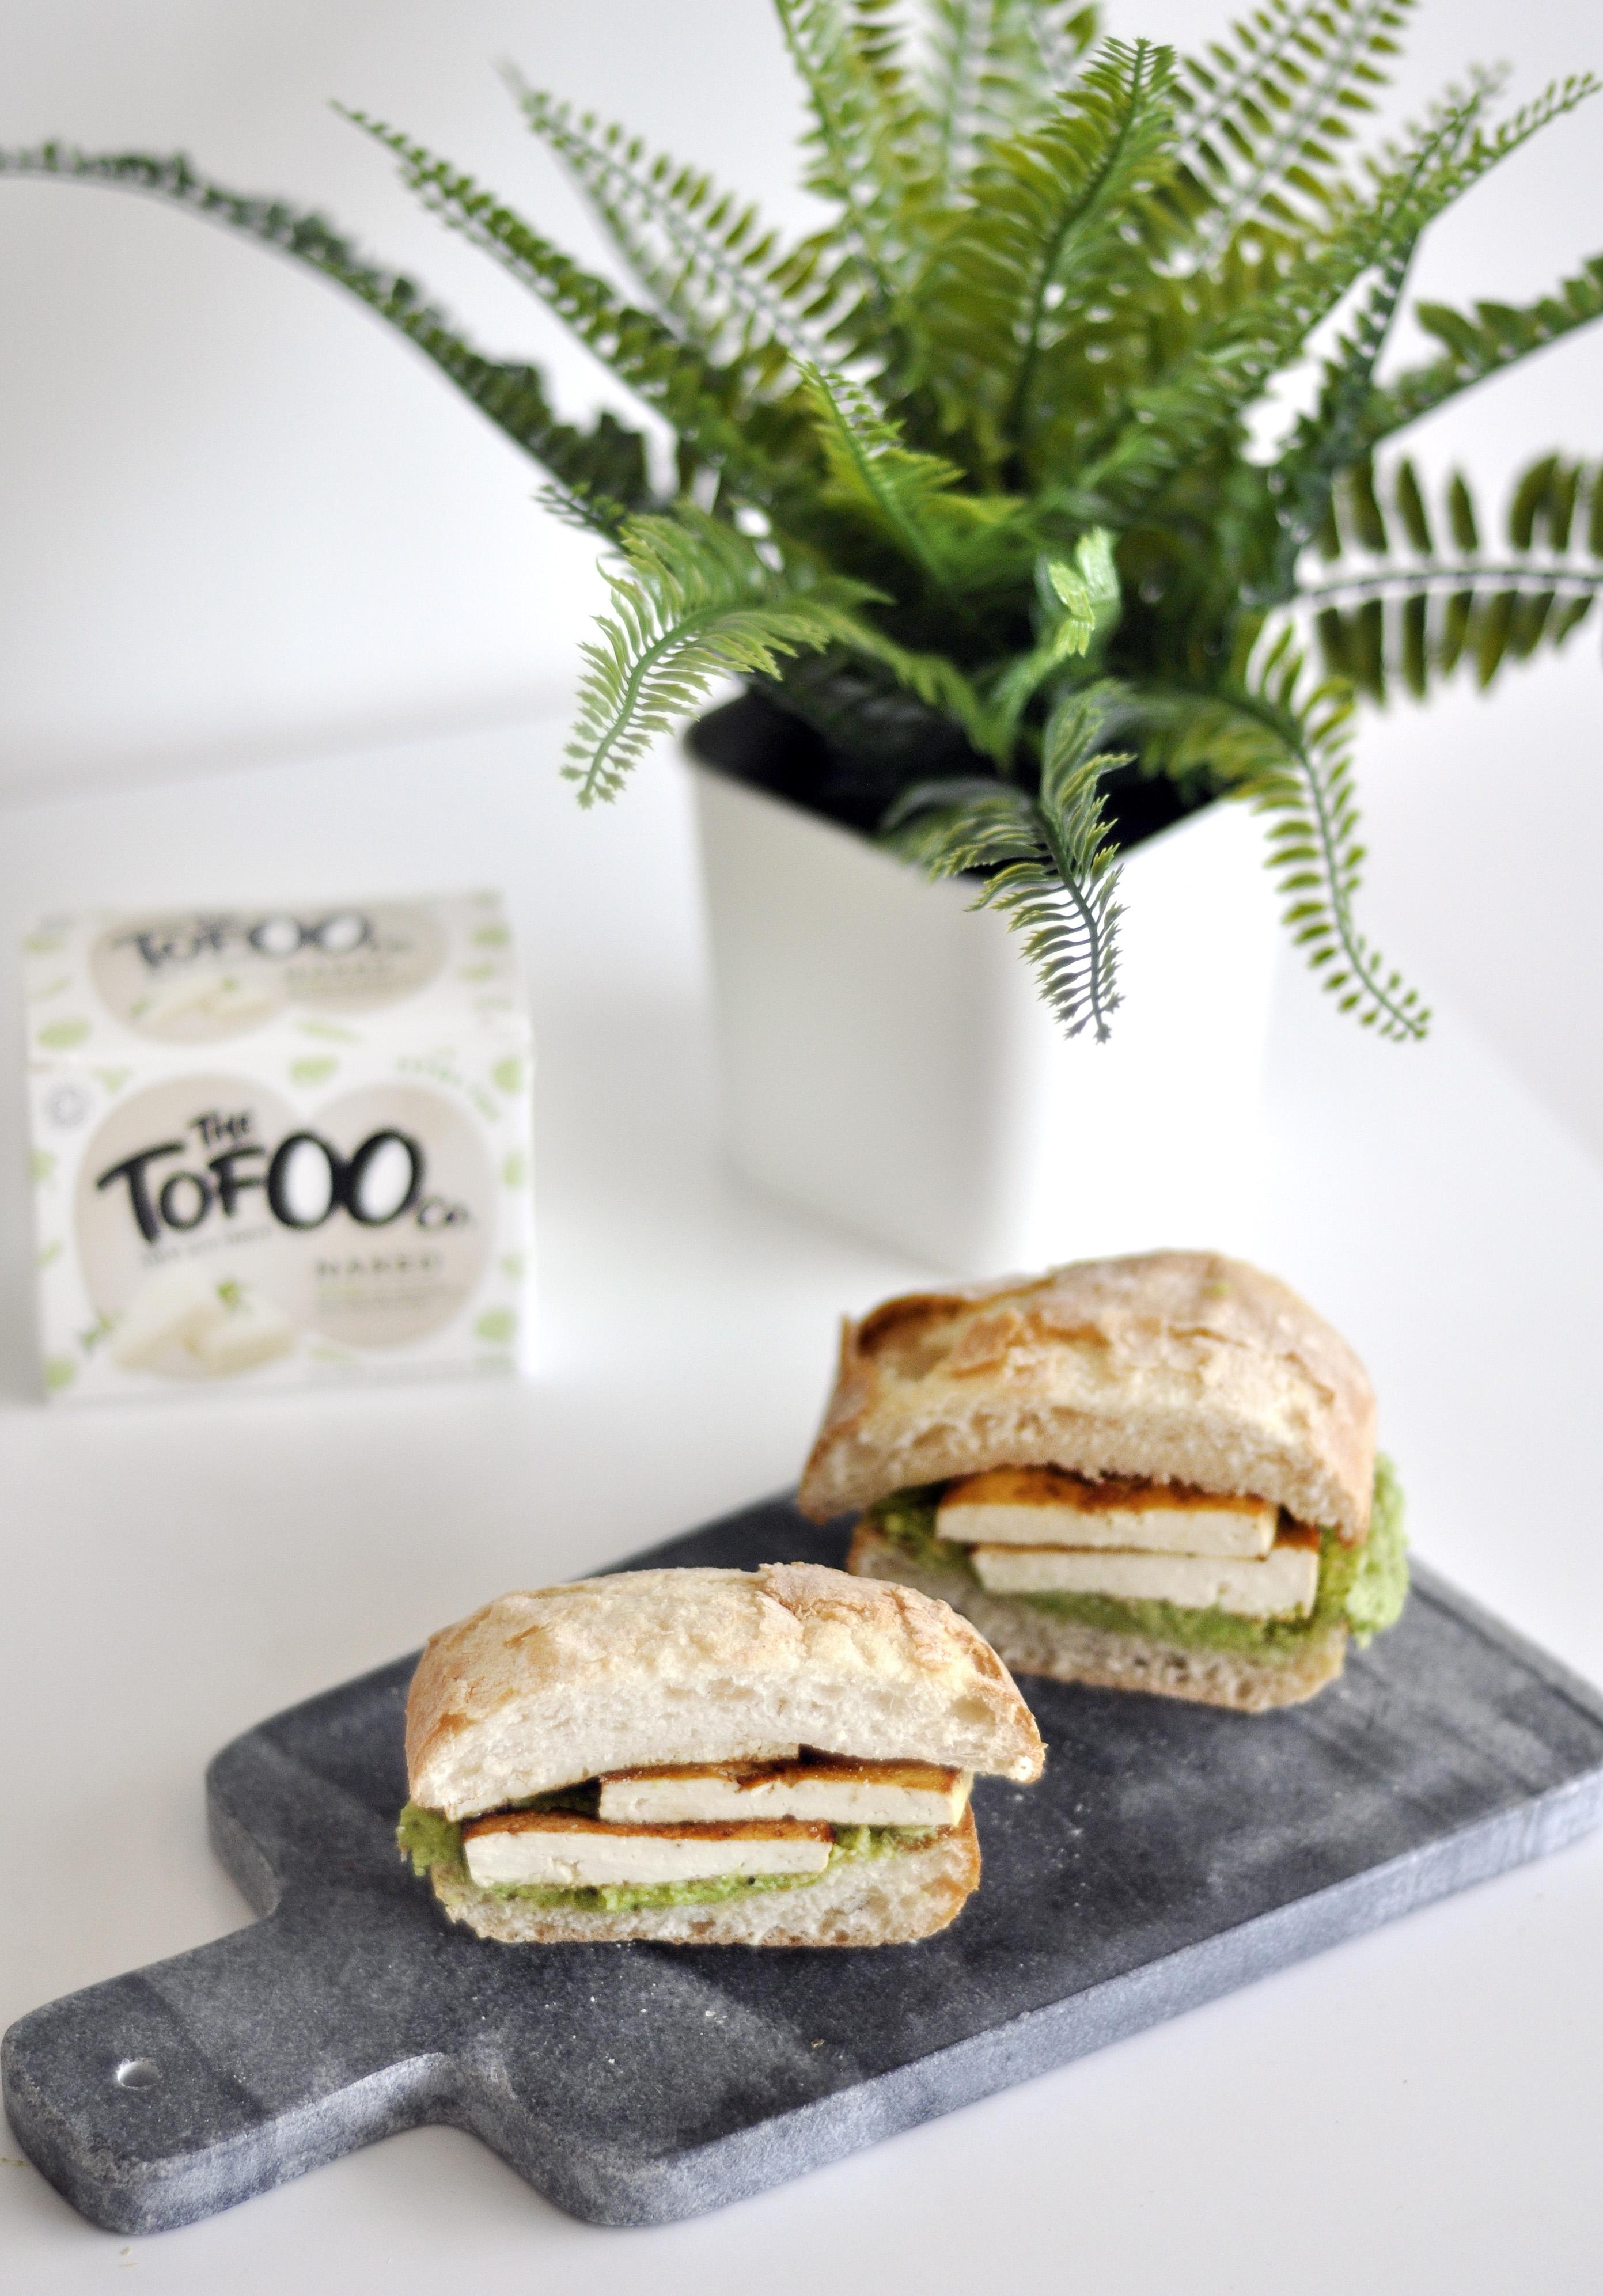 Vegan Tofu Avocado Sandwich